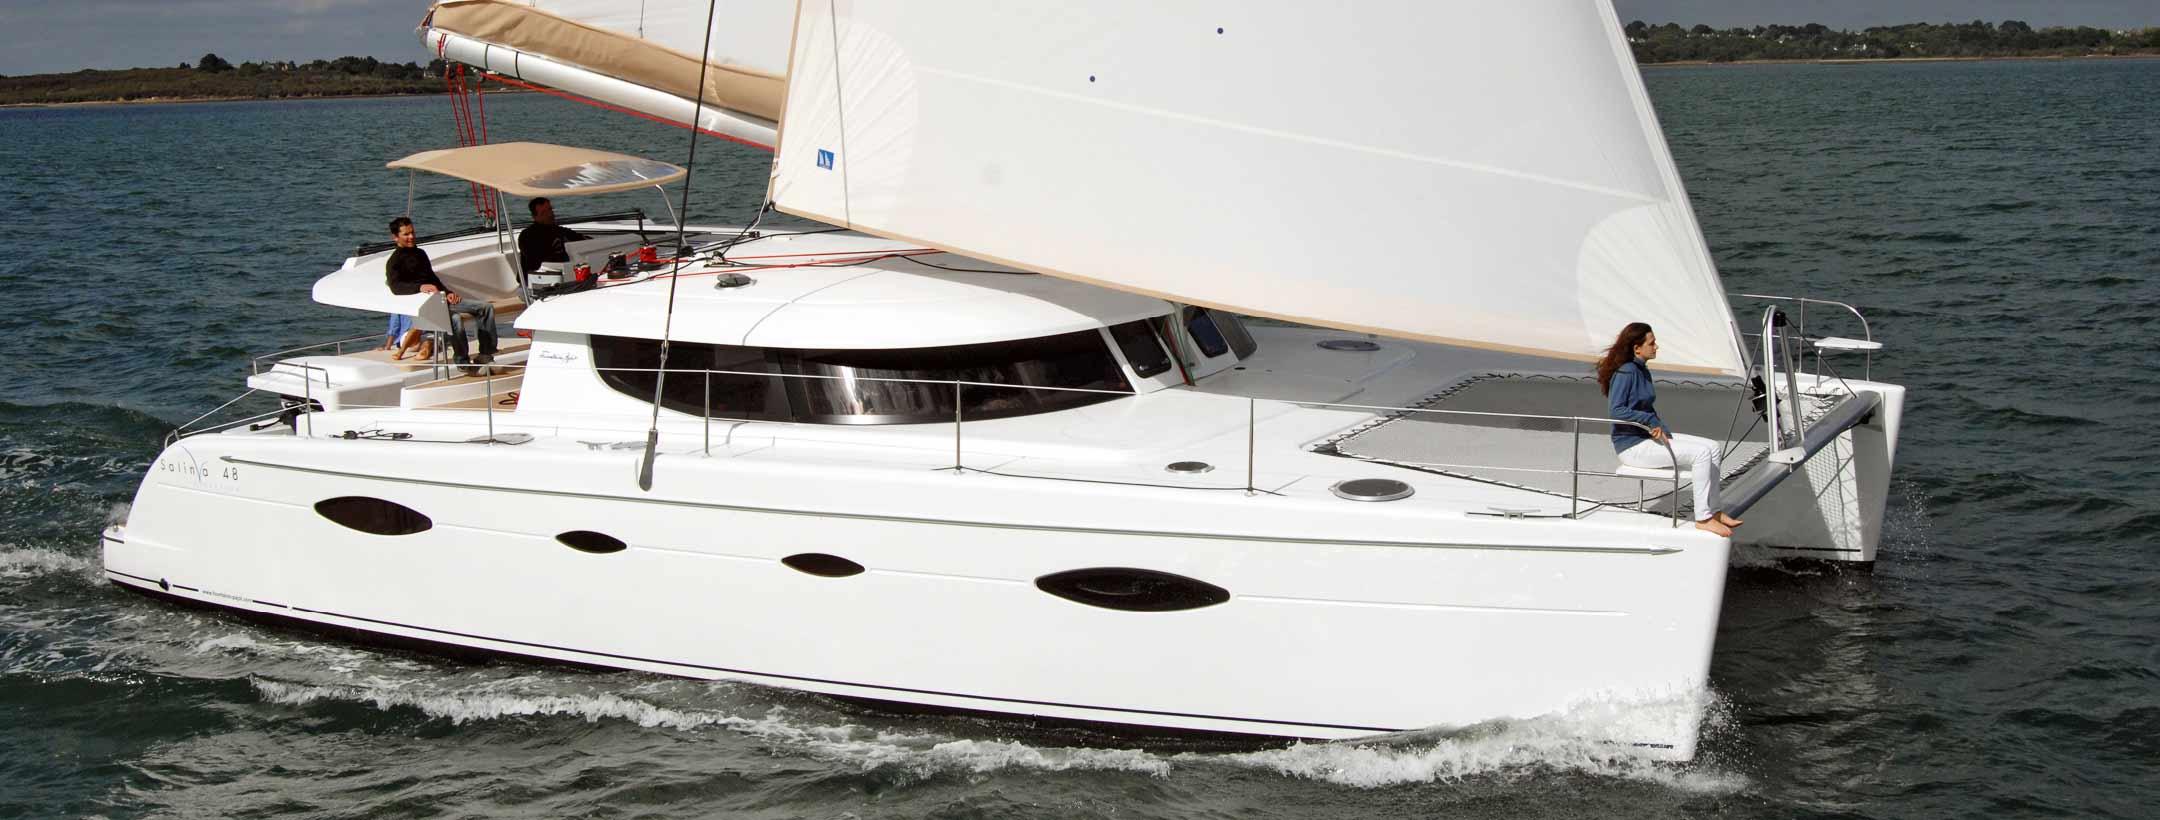 TradeWinds 50 Cruising Class Yacht